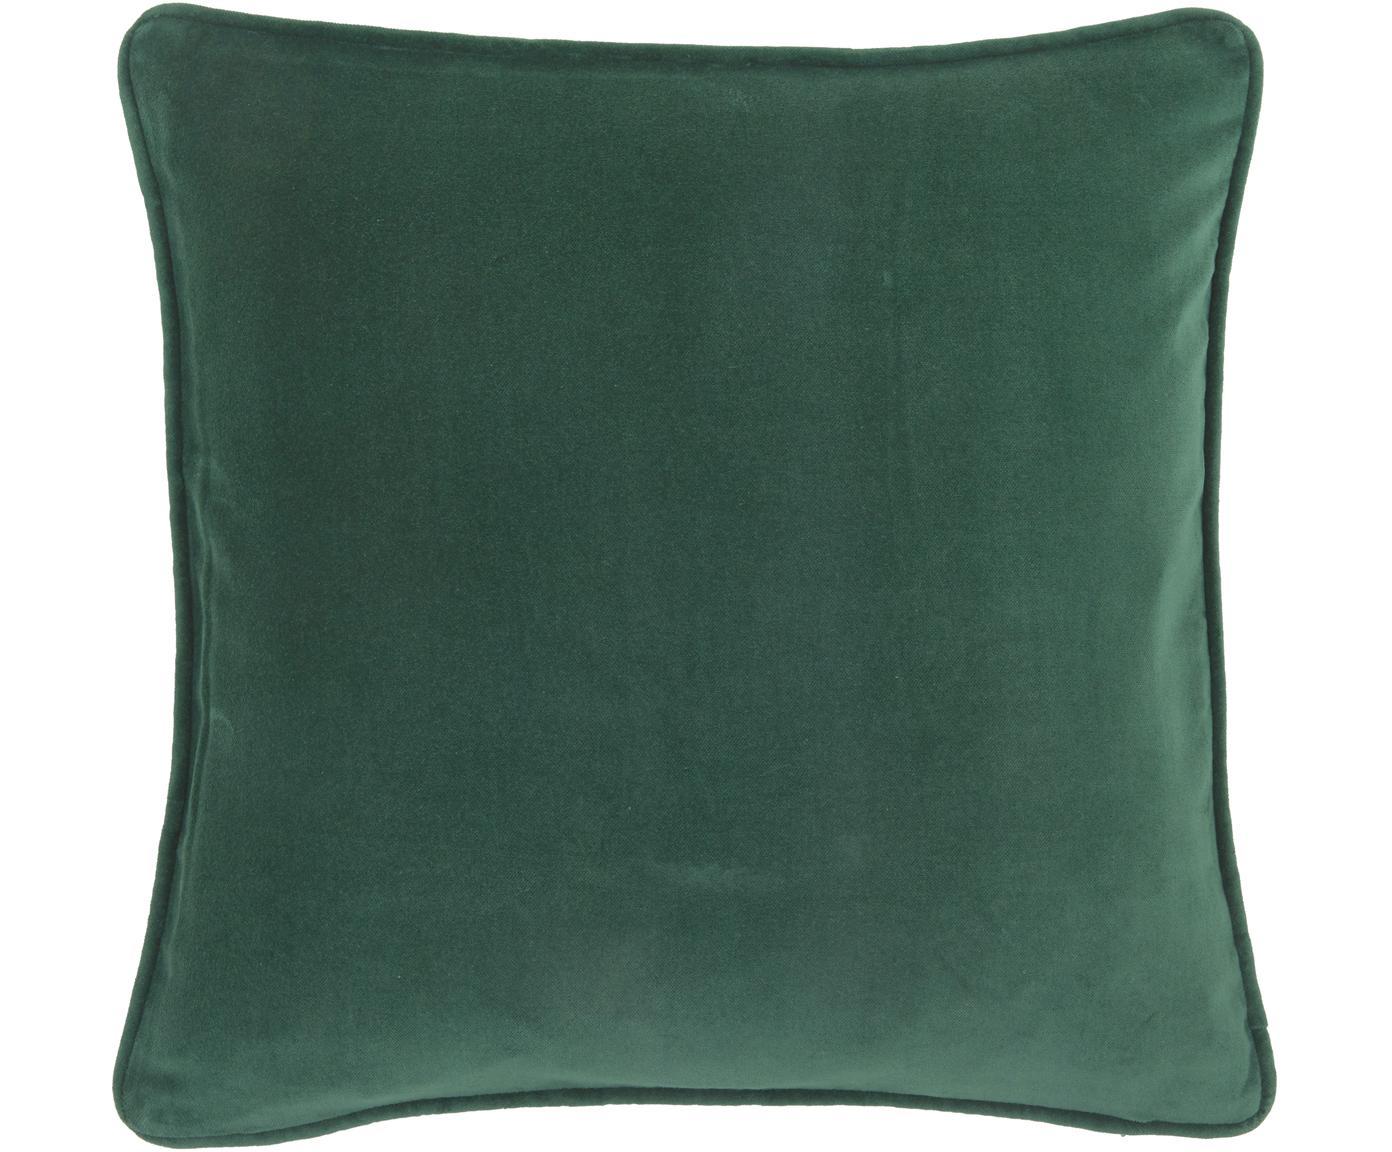 Einfarbige Samt-Kissenhülle Dana in Smaragdgrün, 100% Baumwollsamt, Smaragdgrün, 50 x 50 cm